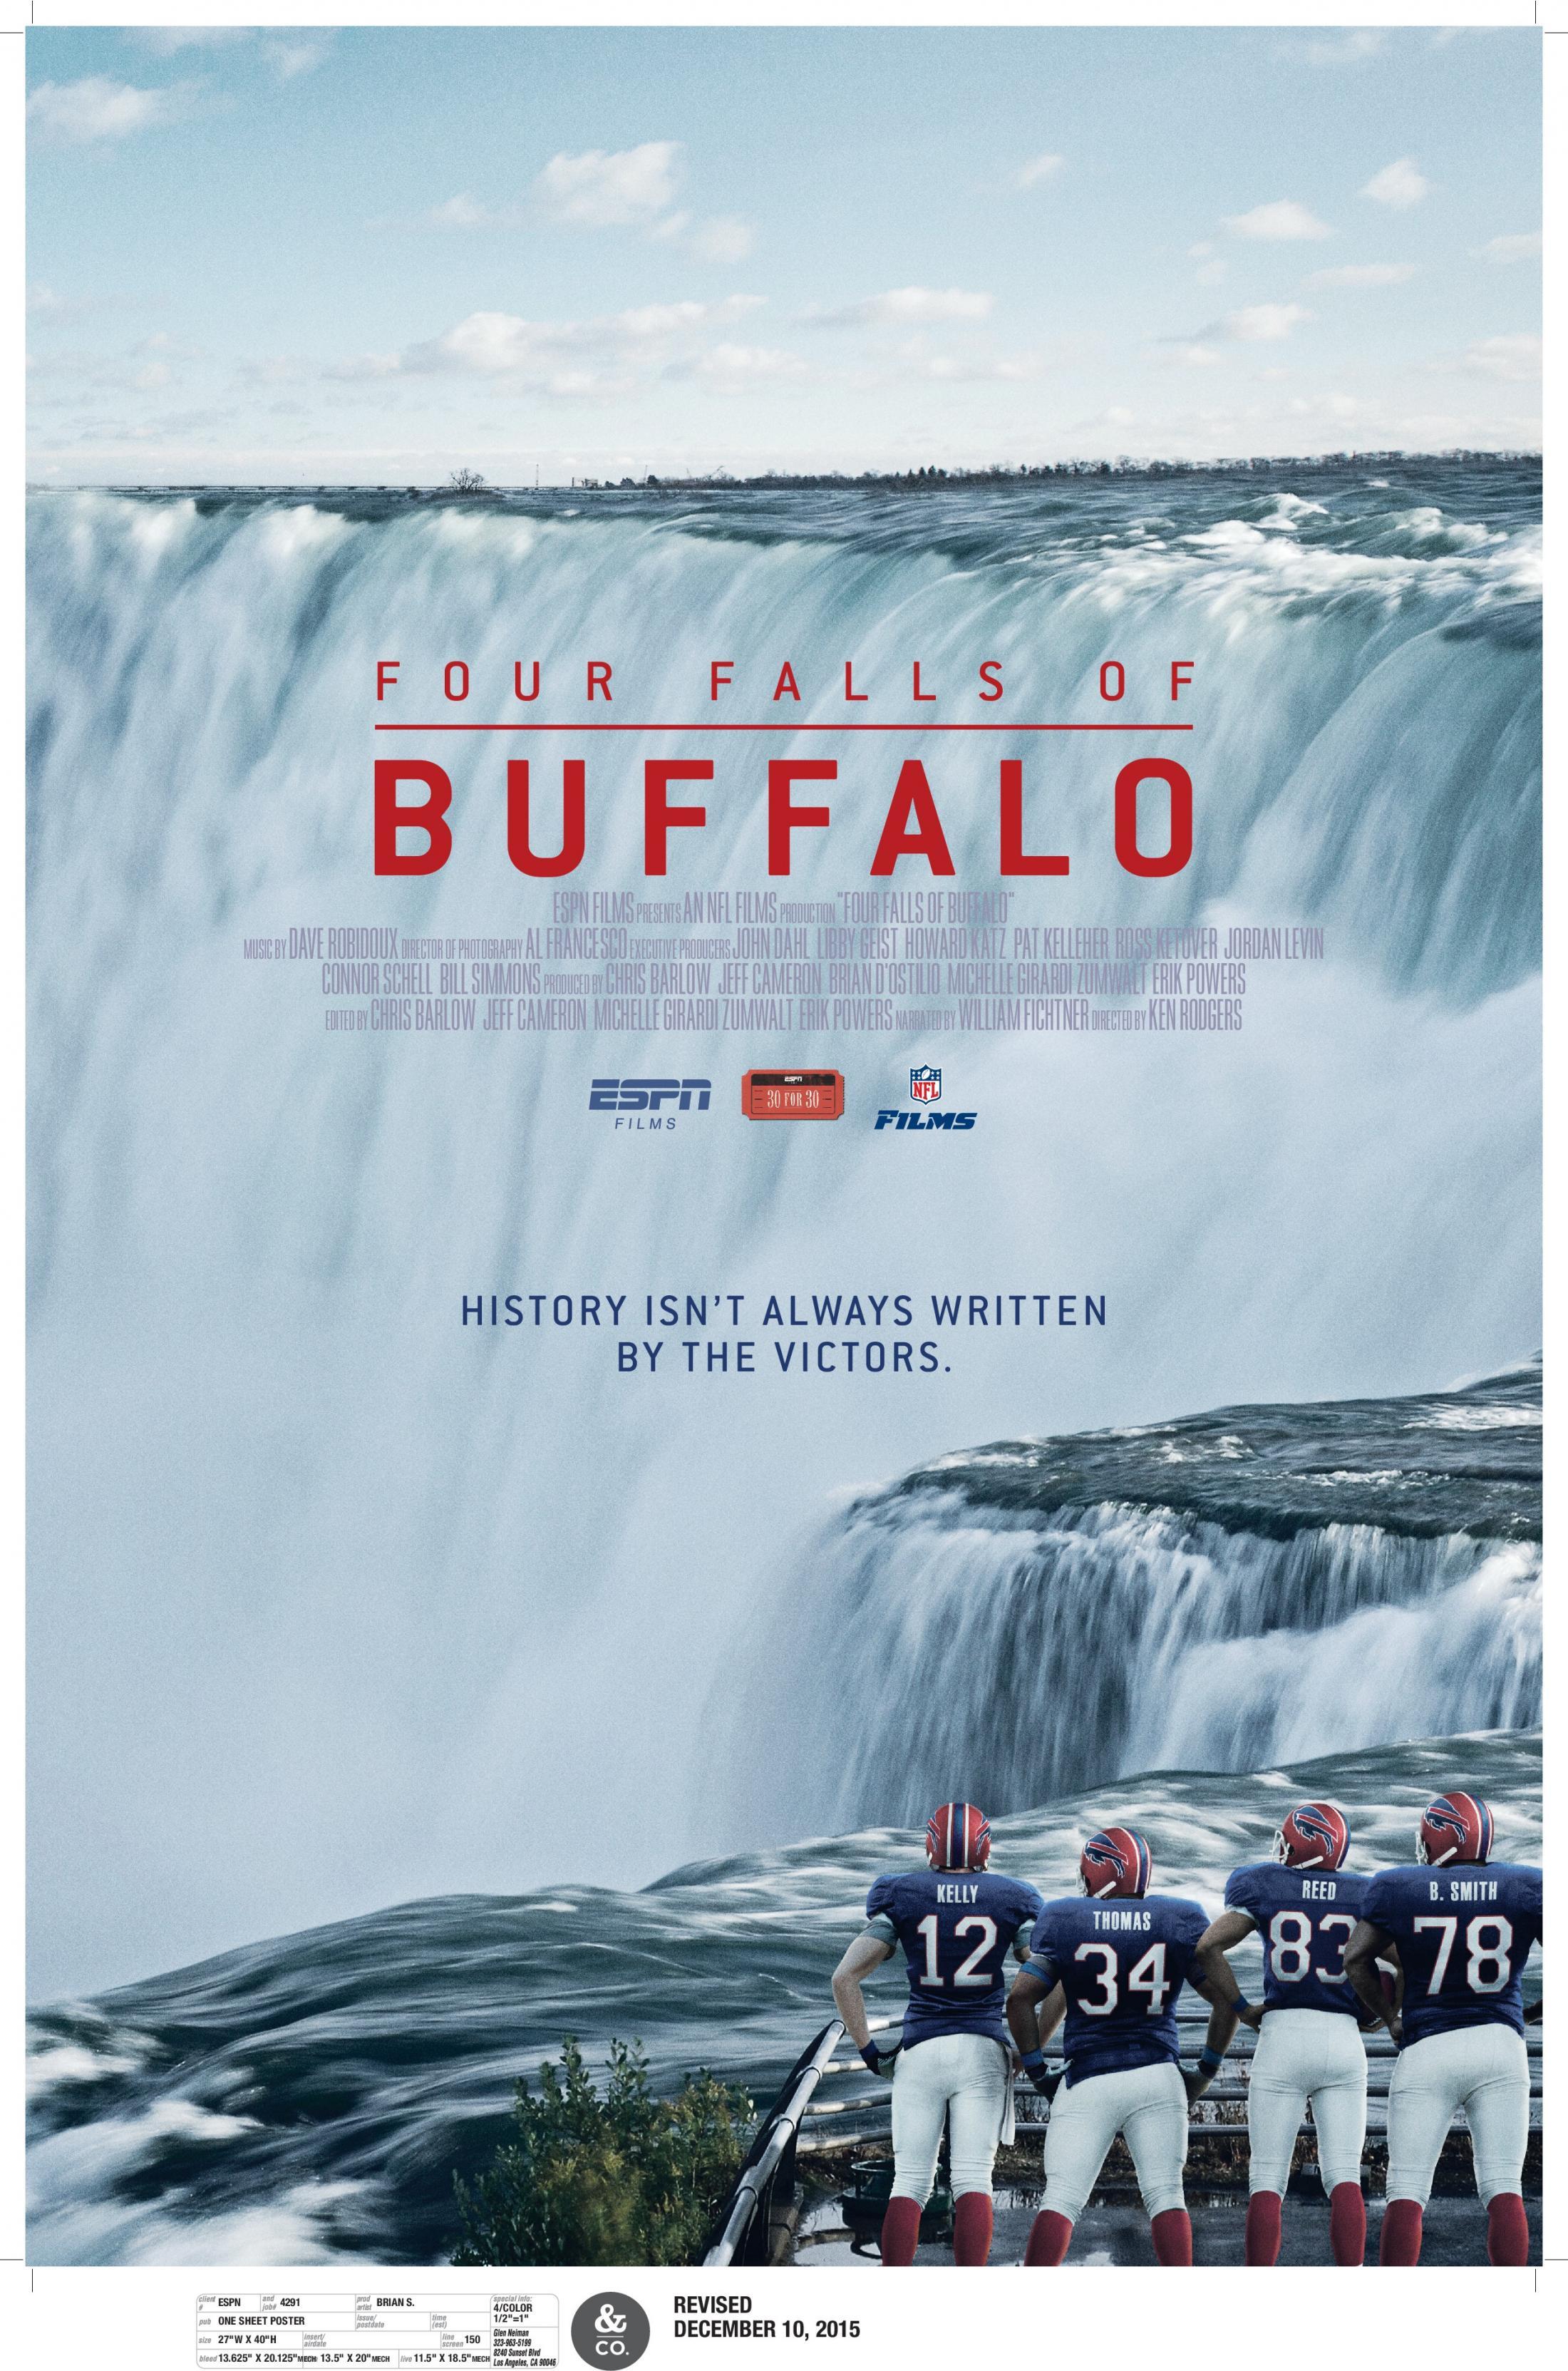 Thumbnail for Four Falls Of Buffalo